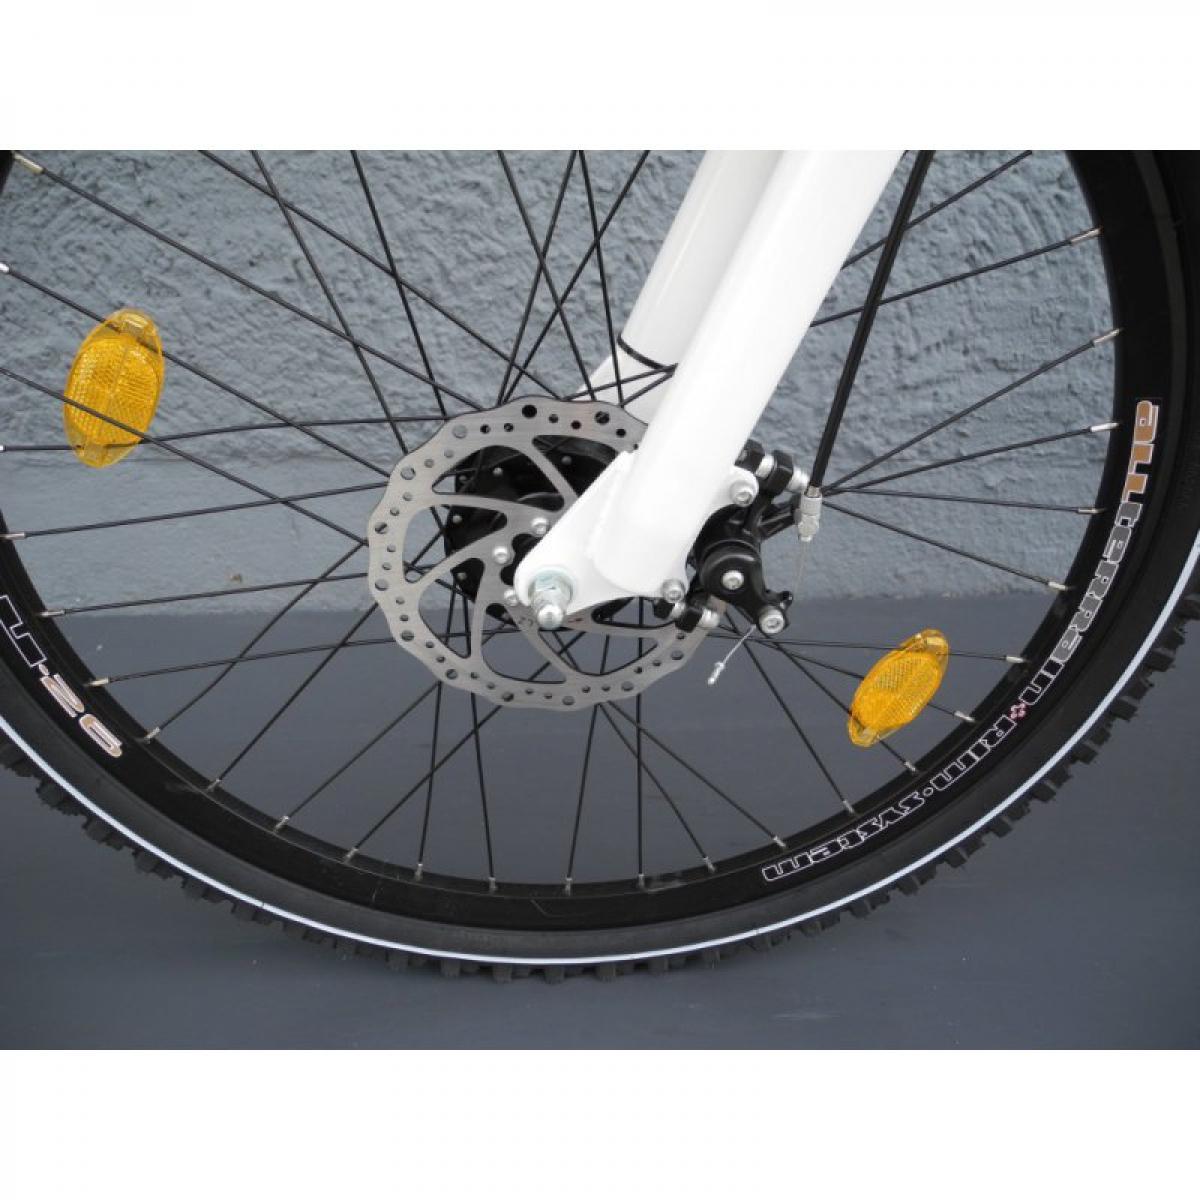 26 zoll alu mtb fahrrad 21 gang shimano nabendynamo stvzo disc ihr fahrrad online shop bei. Black Bedroom Furniture Sets. Home Design Ideas